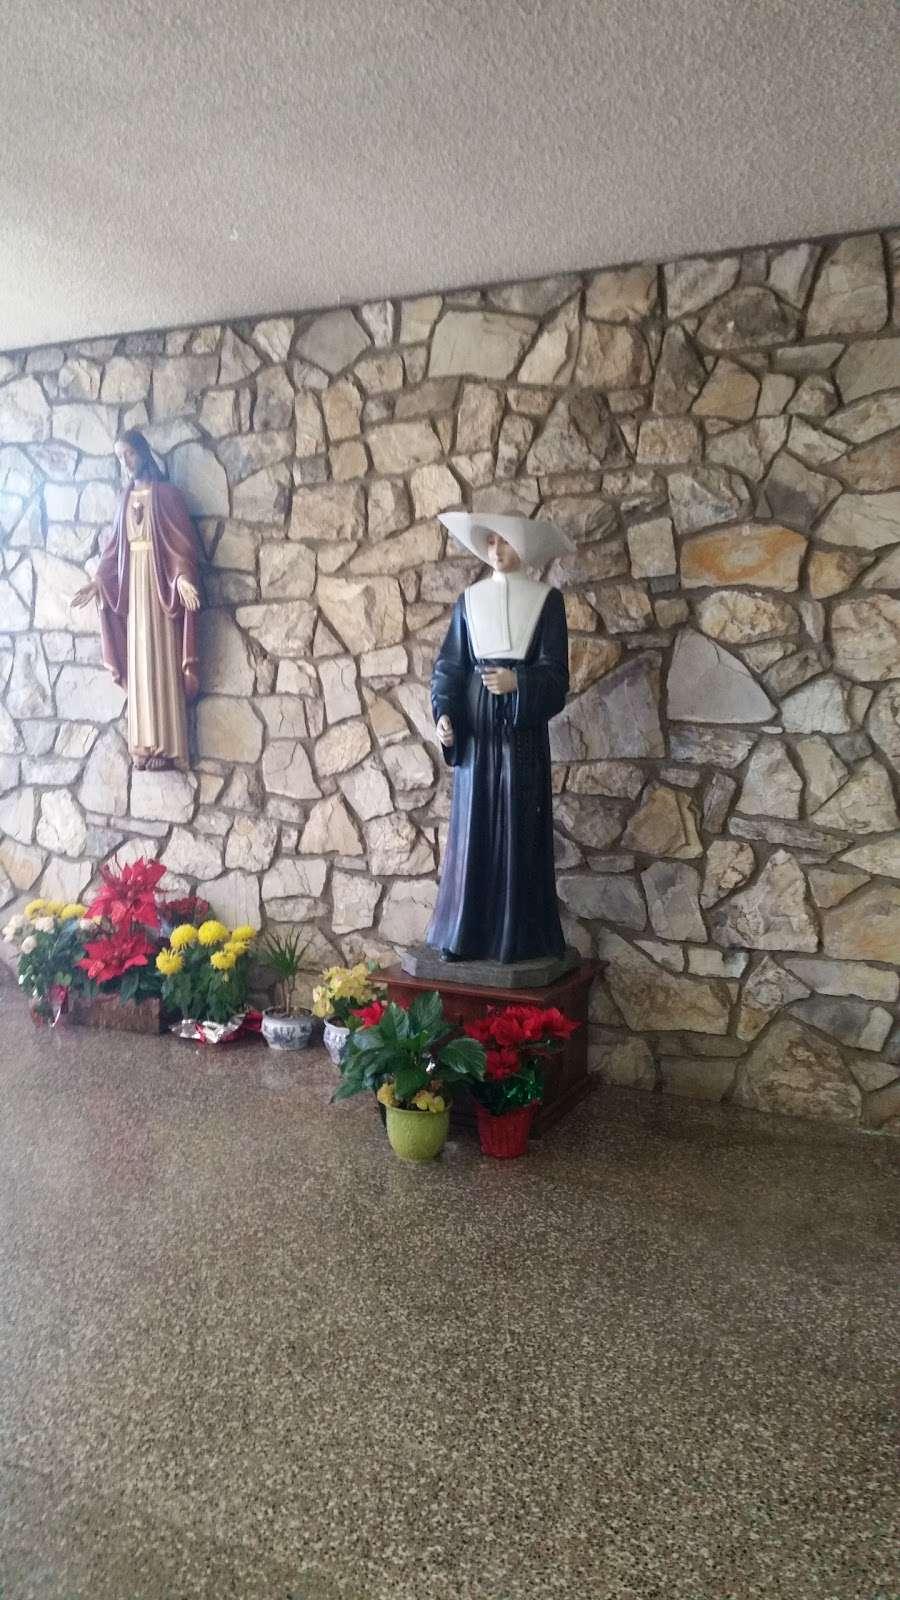 St. Catherine Laboure Church - church  | Photo 7 of 10 | Address: 3846 Redondo Beach Blvd, Torrance, CA 90504, USA | Phone: (310) 323-8900